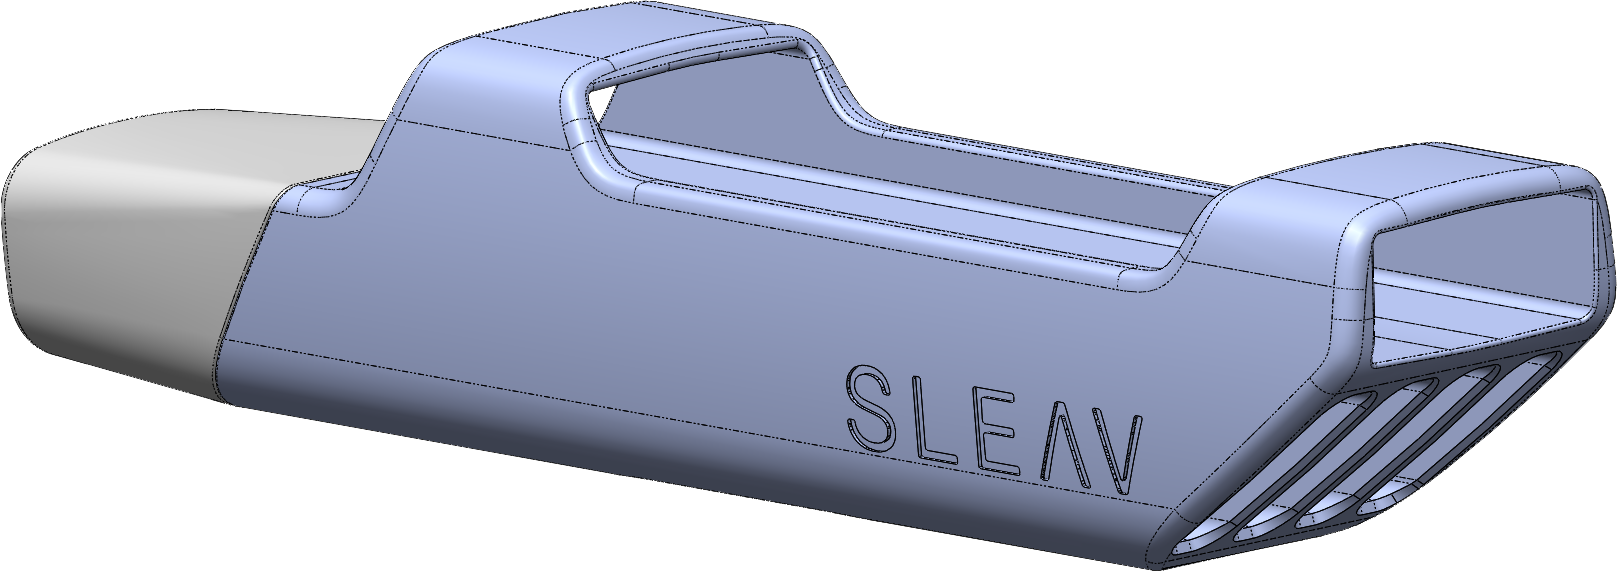 Filter Assembly CAD